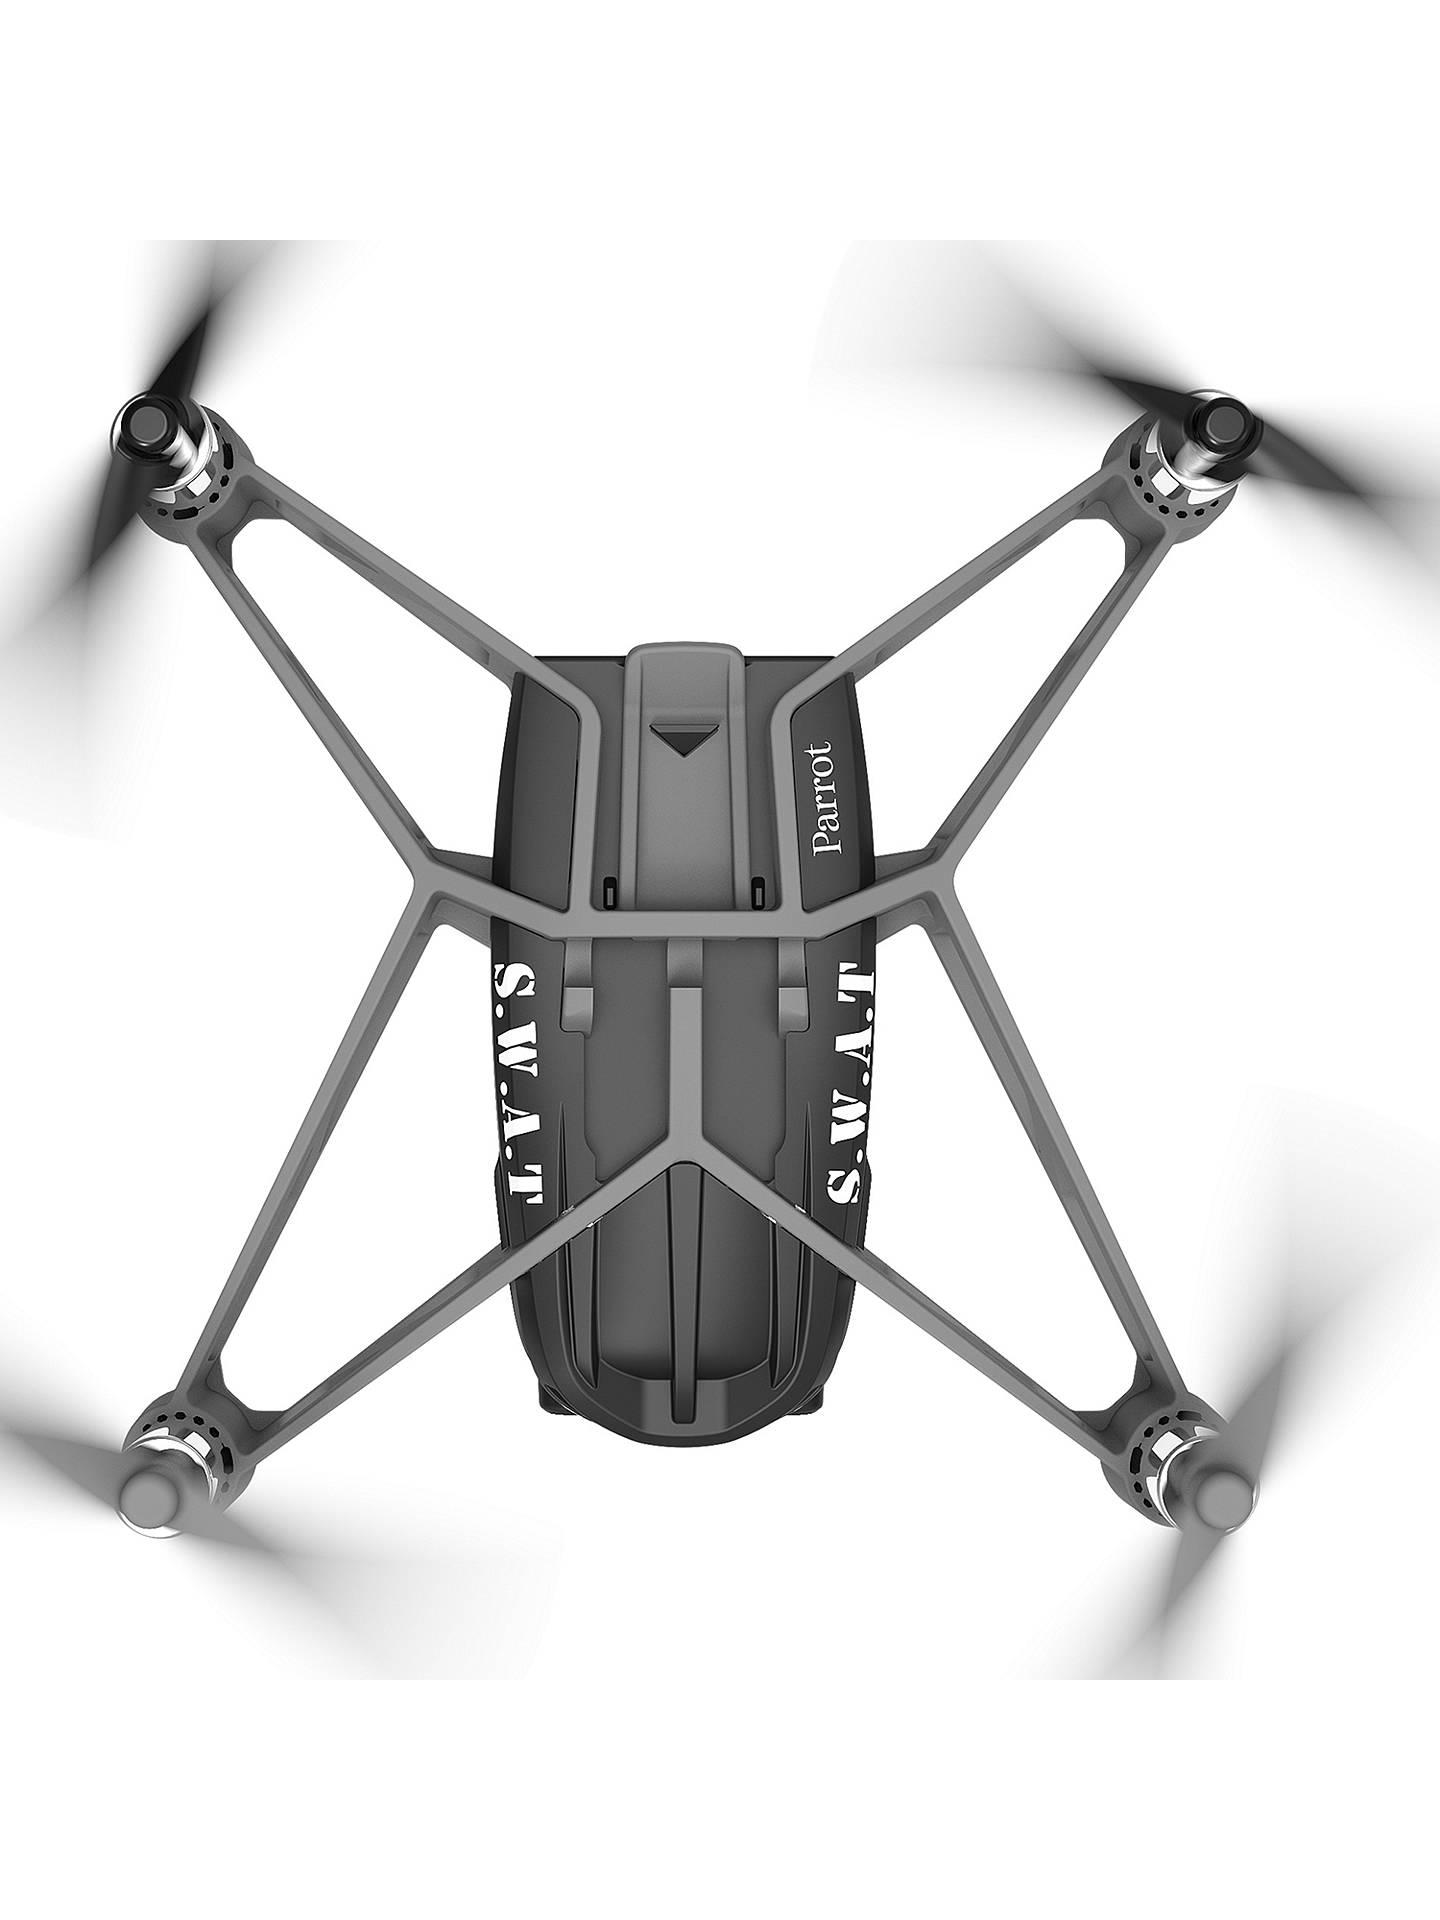 Parrot Swat Airborne Night Minidrone Black At John Lewis Partners Minidrones Hydrofoil Drone Orak Buyparrot Online